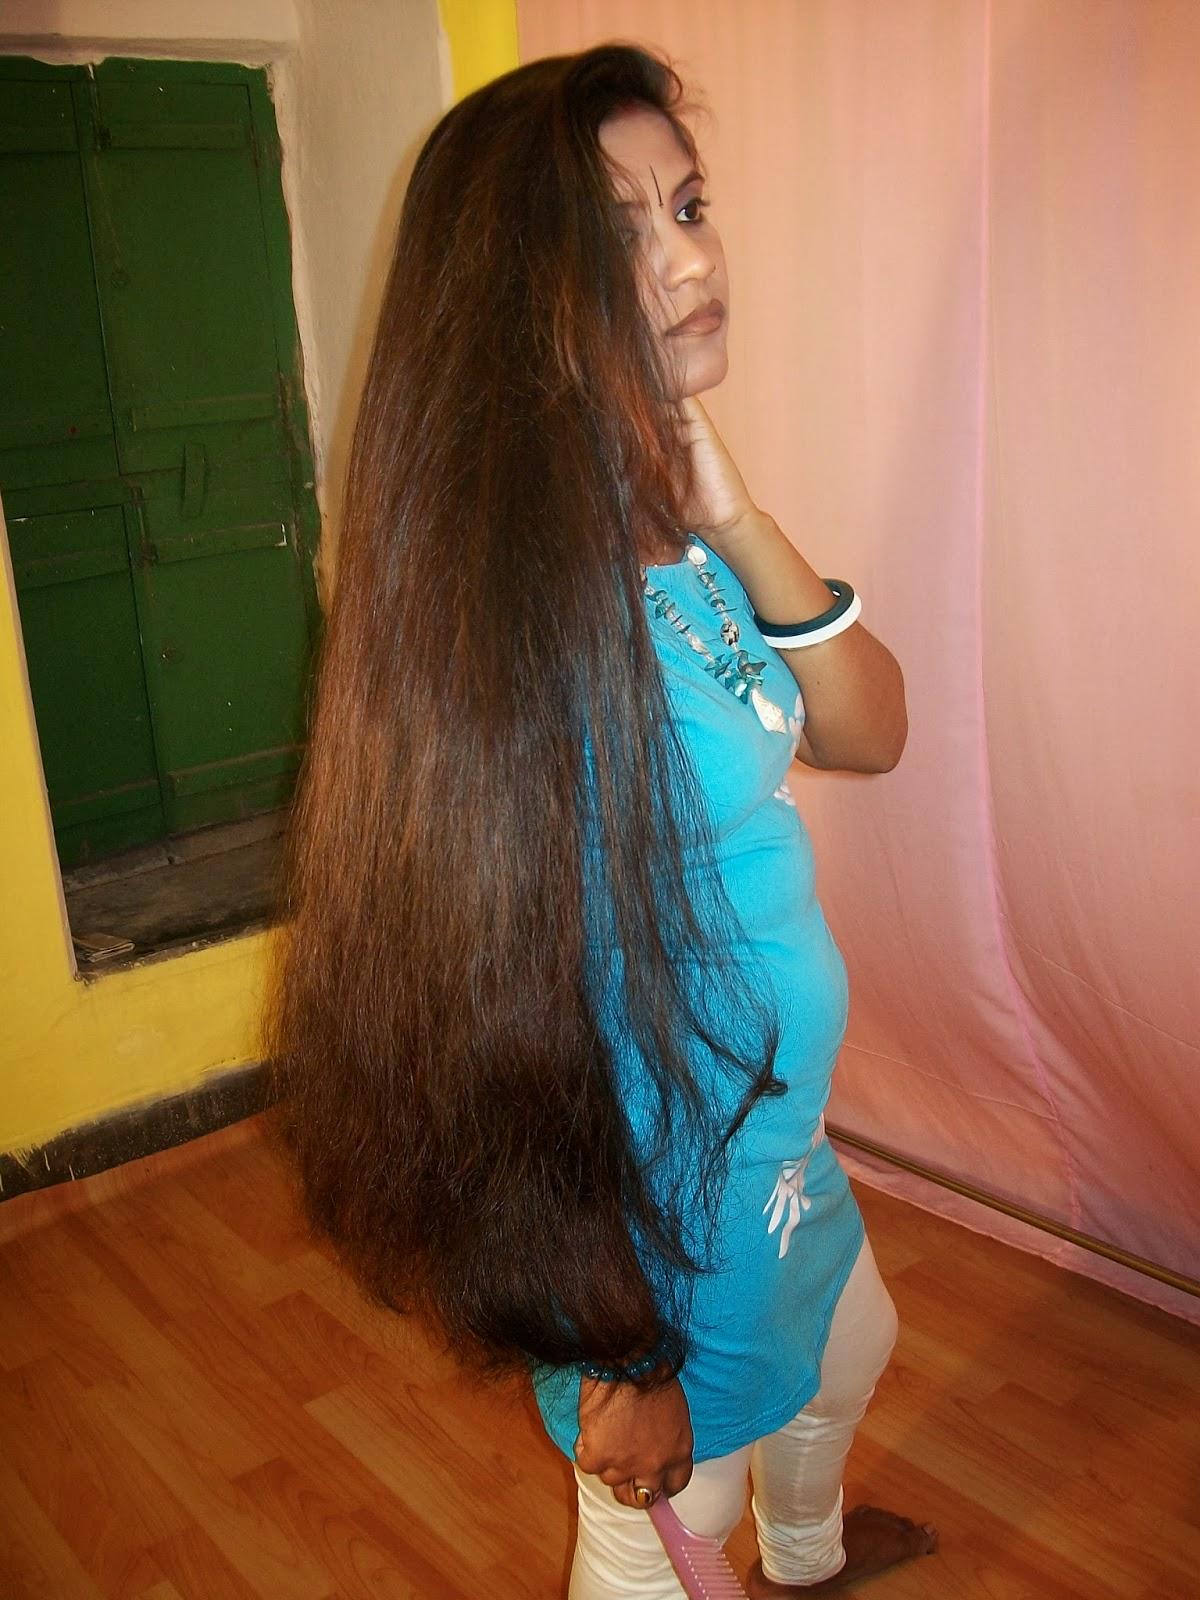 Long hair hair hairjob fuck hairplay